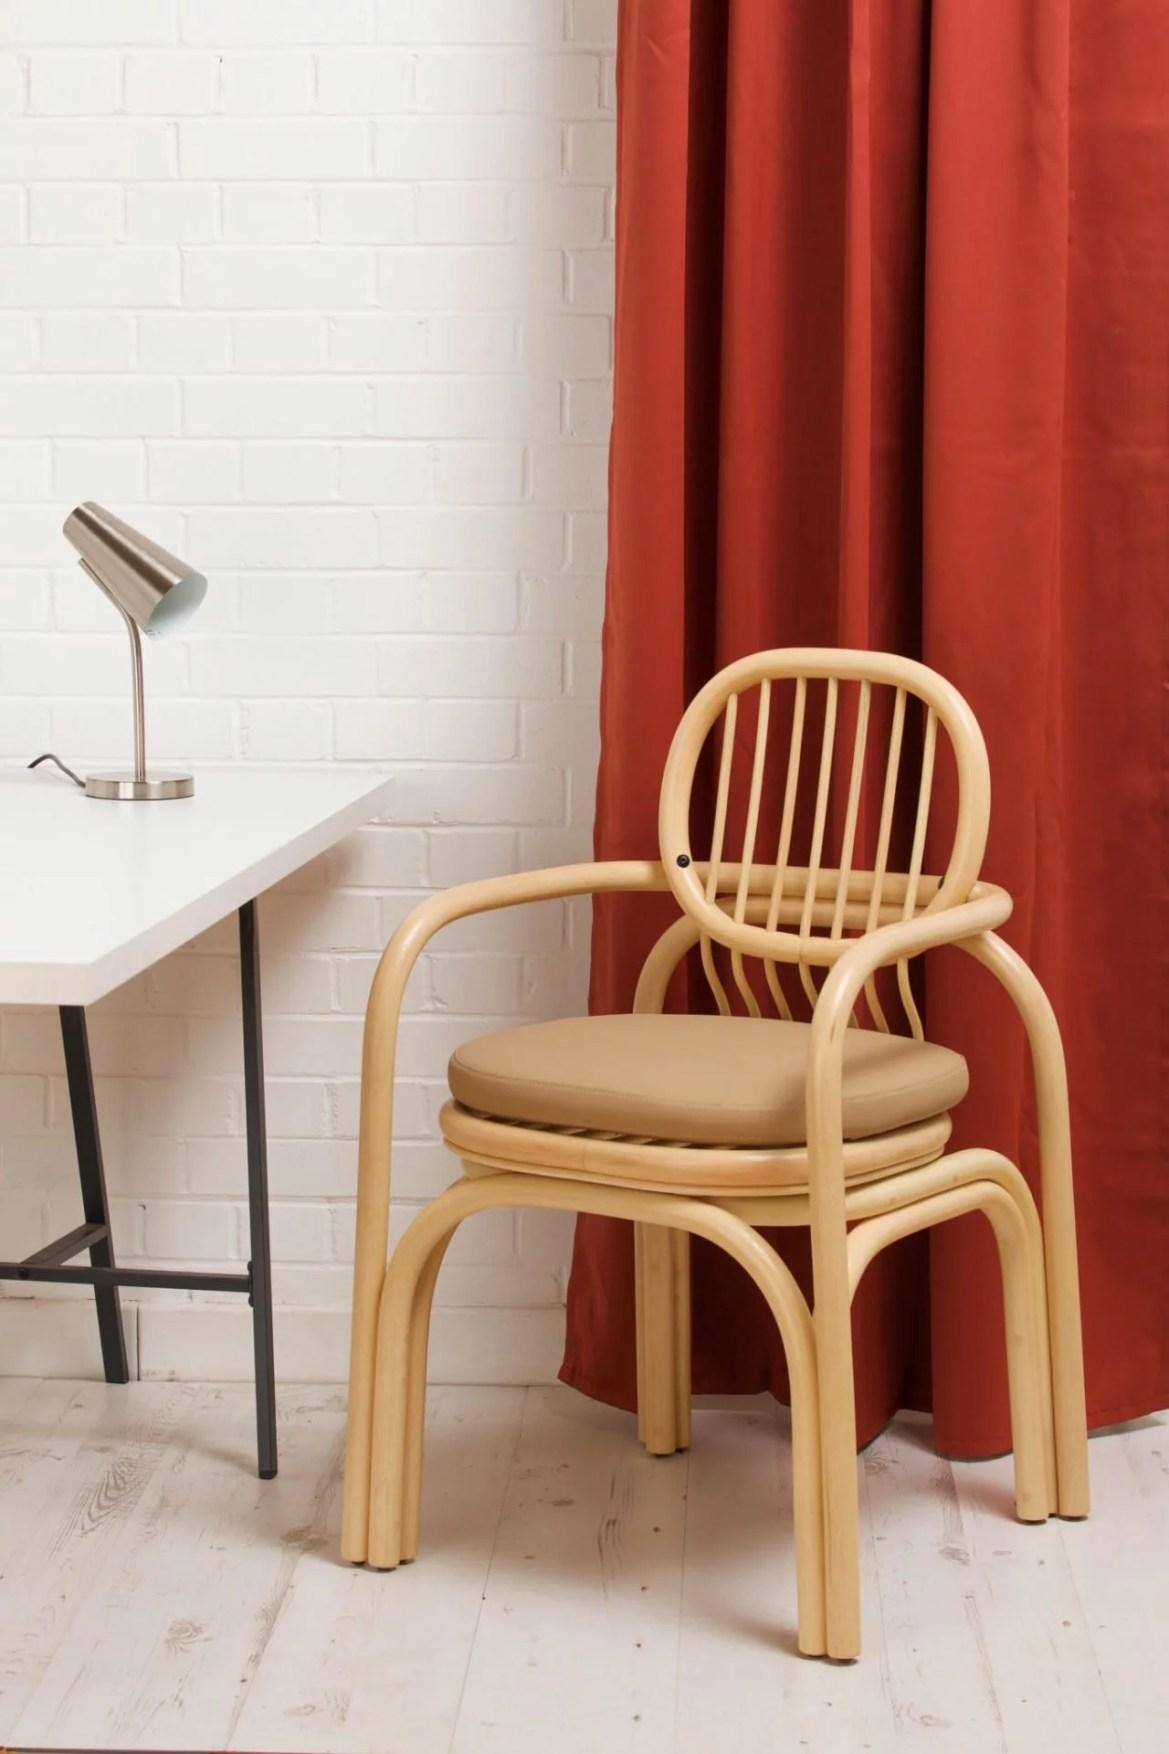 Design, bois, chaise Andrea Mestre, Gandia